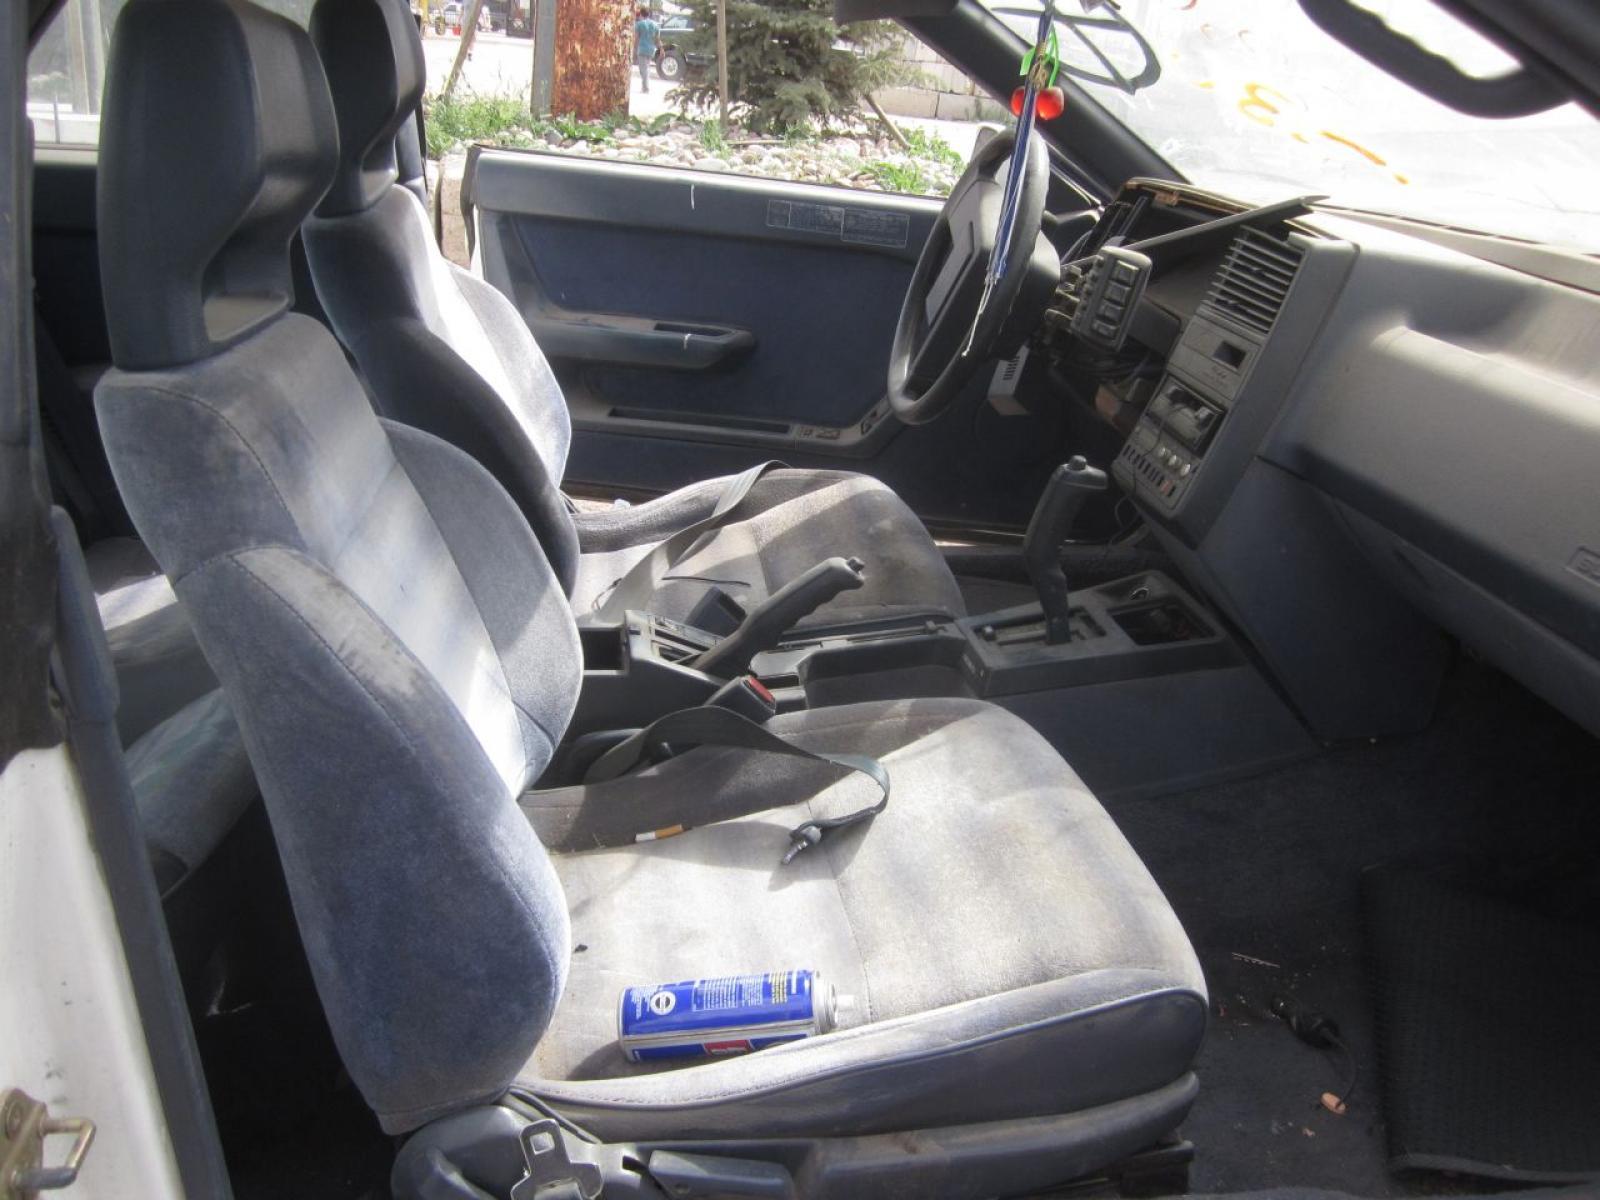 1991 Subaru Xt Information And Photos Zombiedrive